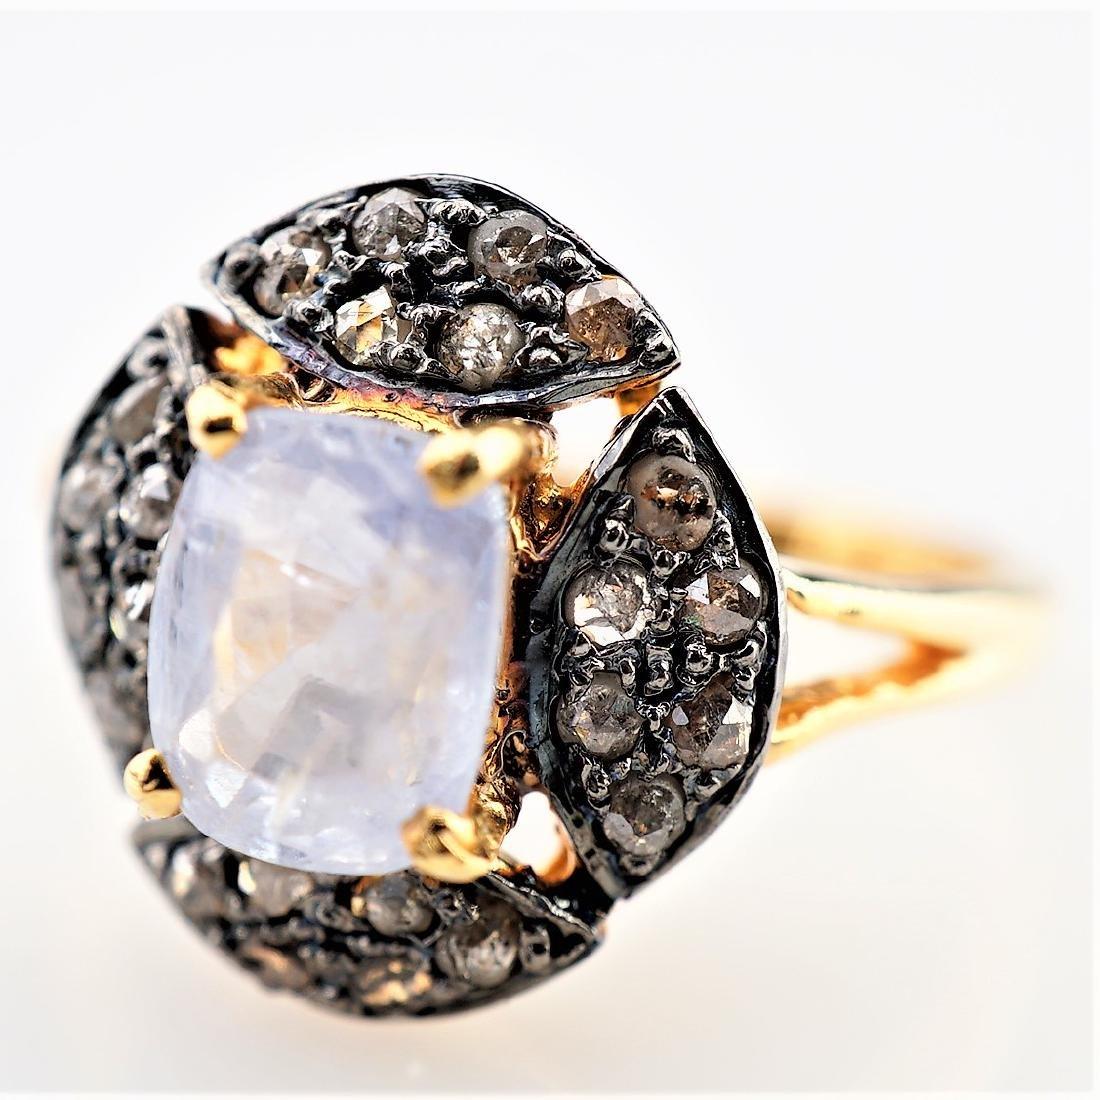 1.95 CT Sapphire Ring with Diamonds sz 6.75